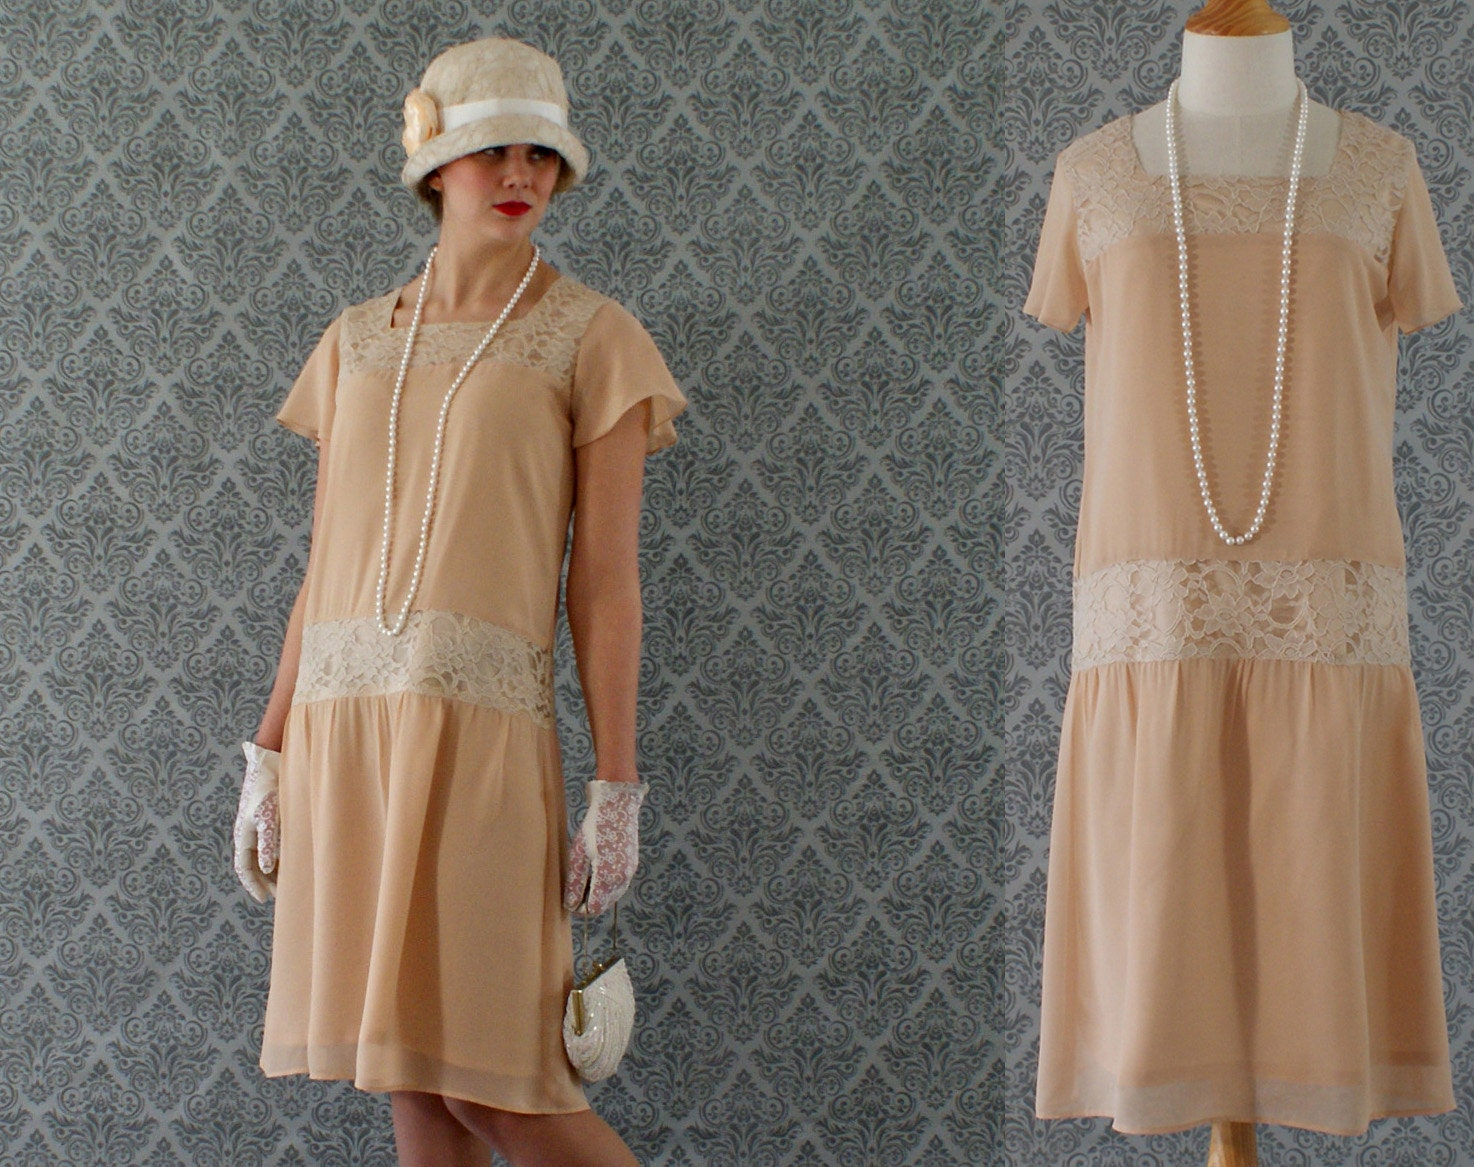 Twenties Party Dresses